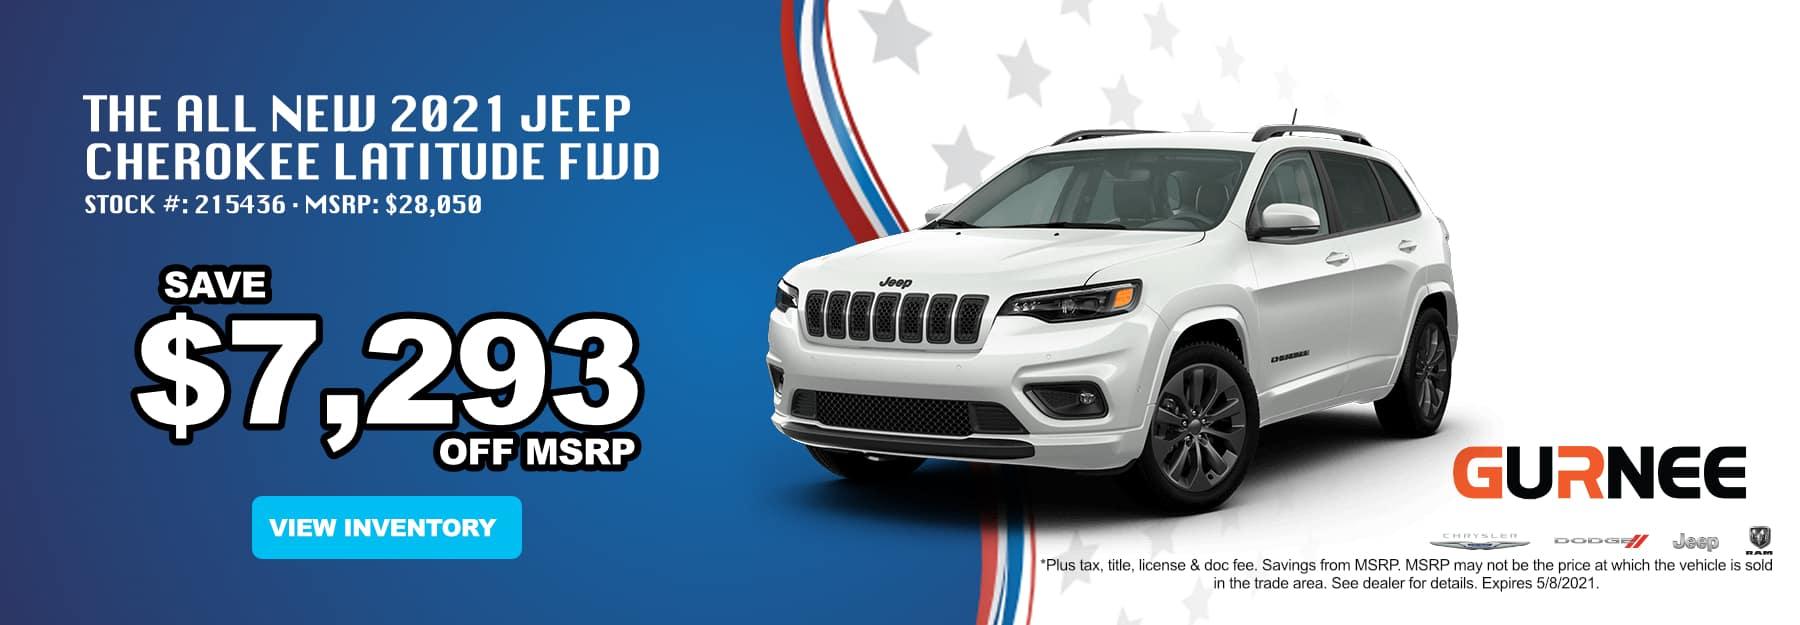 April_2021 Jeep Cherokee_Gurnee